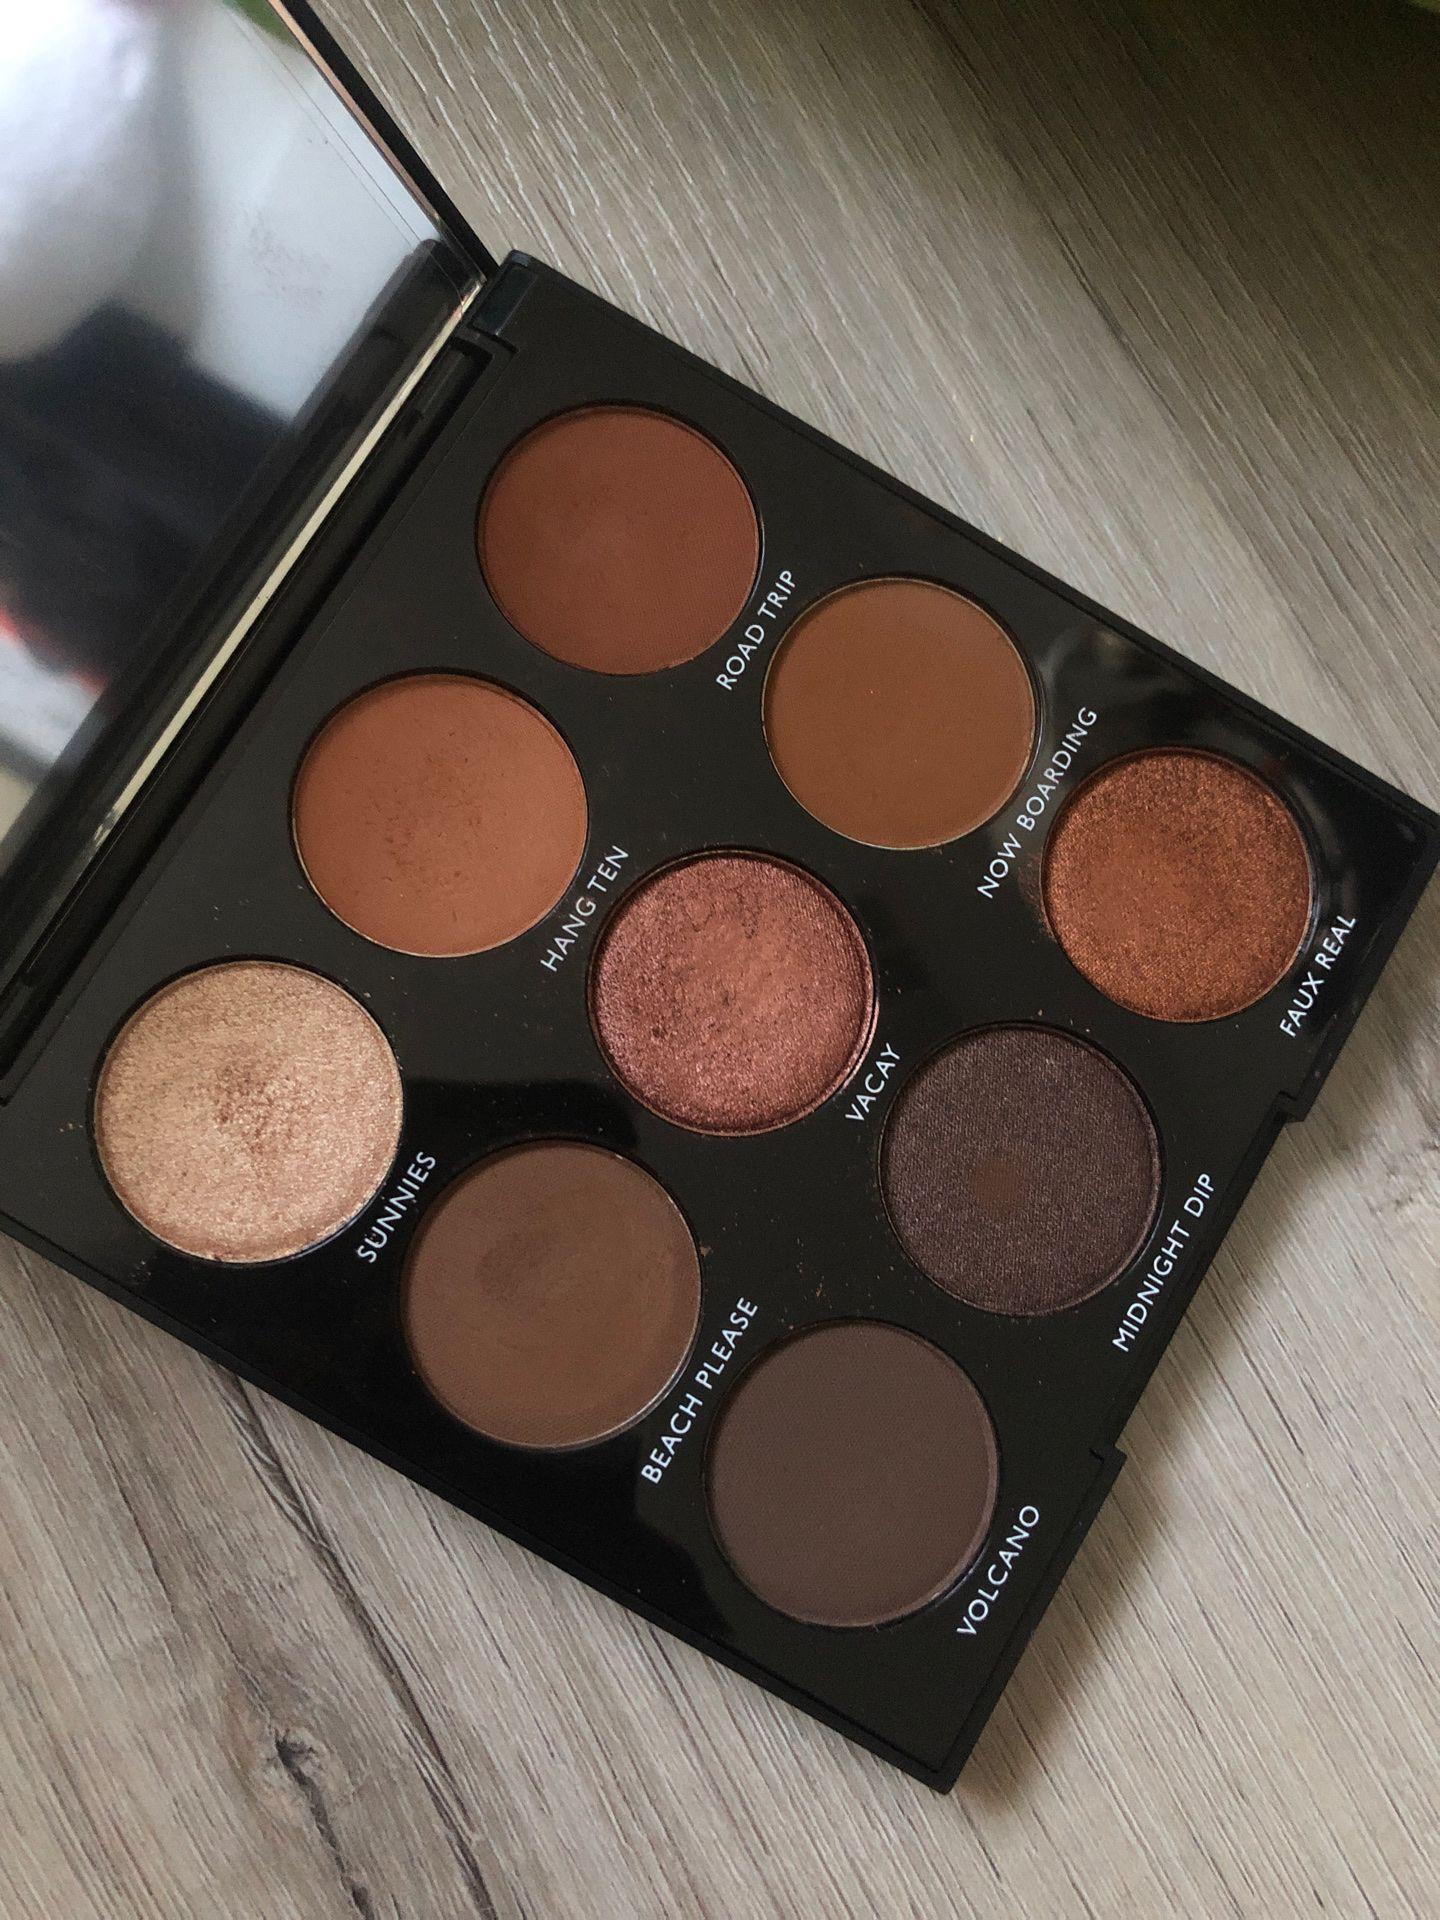 Morphe 9B palette bronzed babe eyeshadow palette